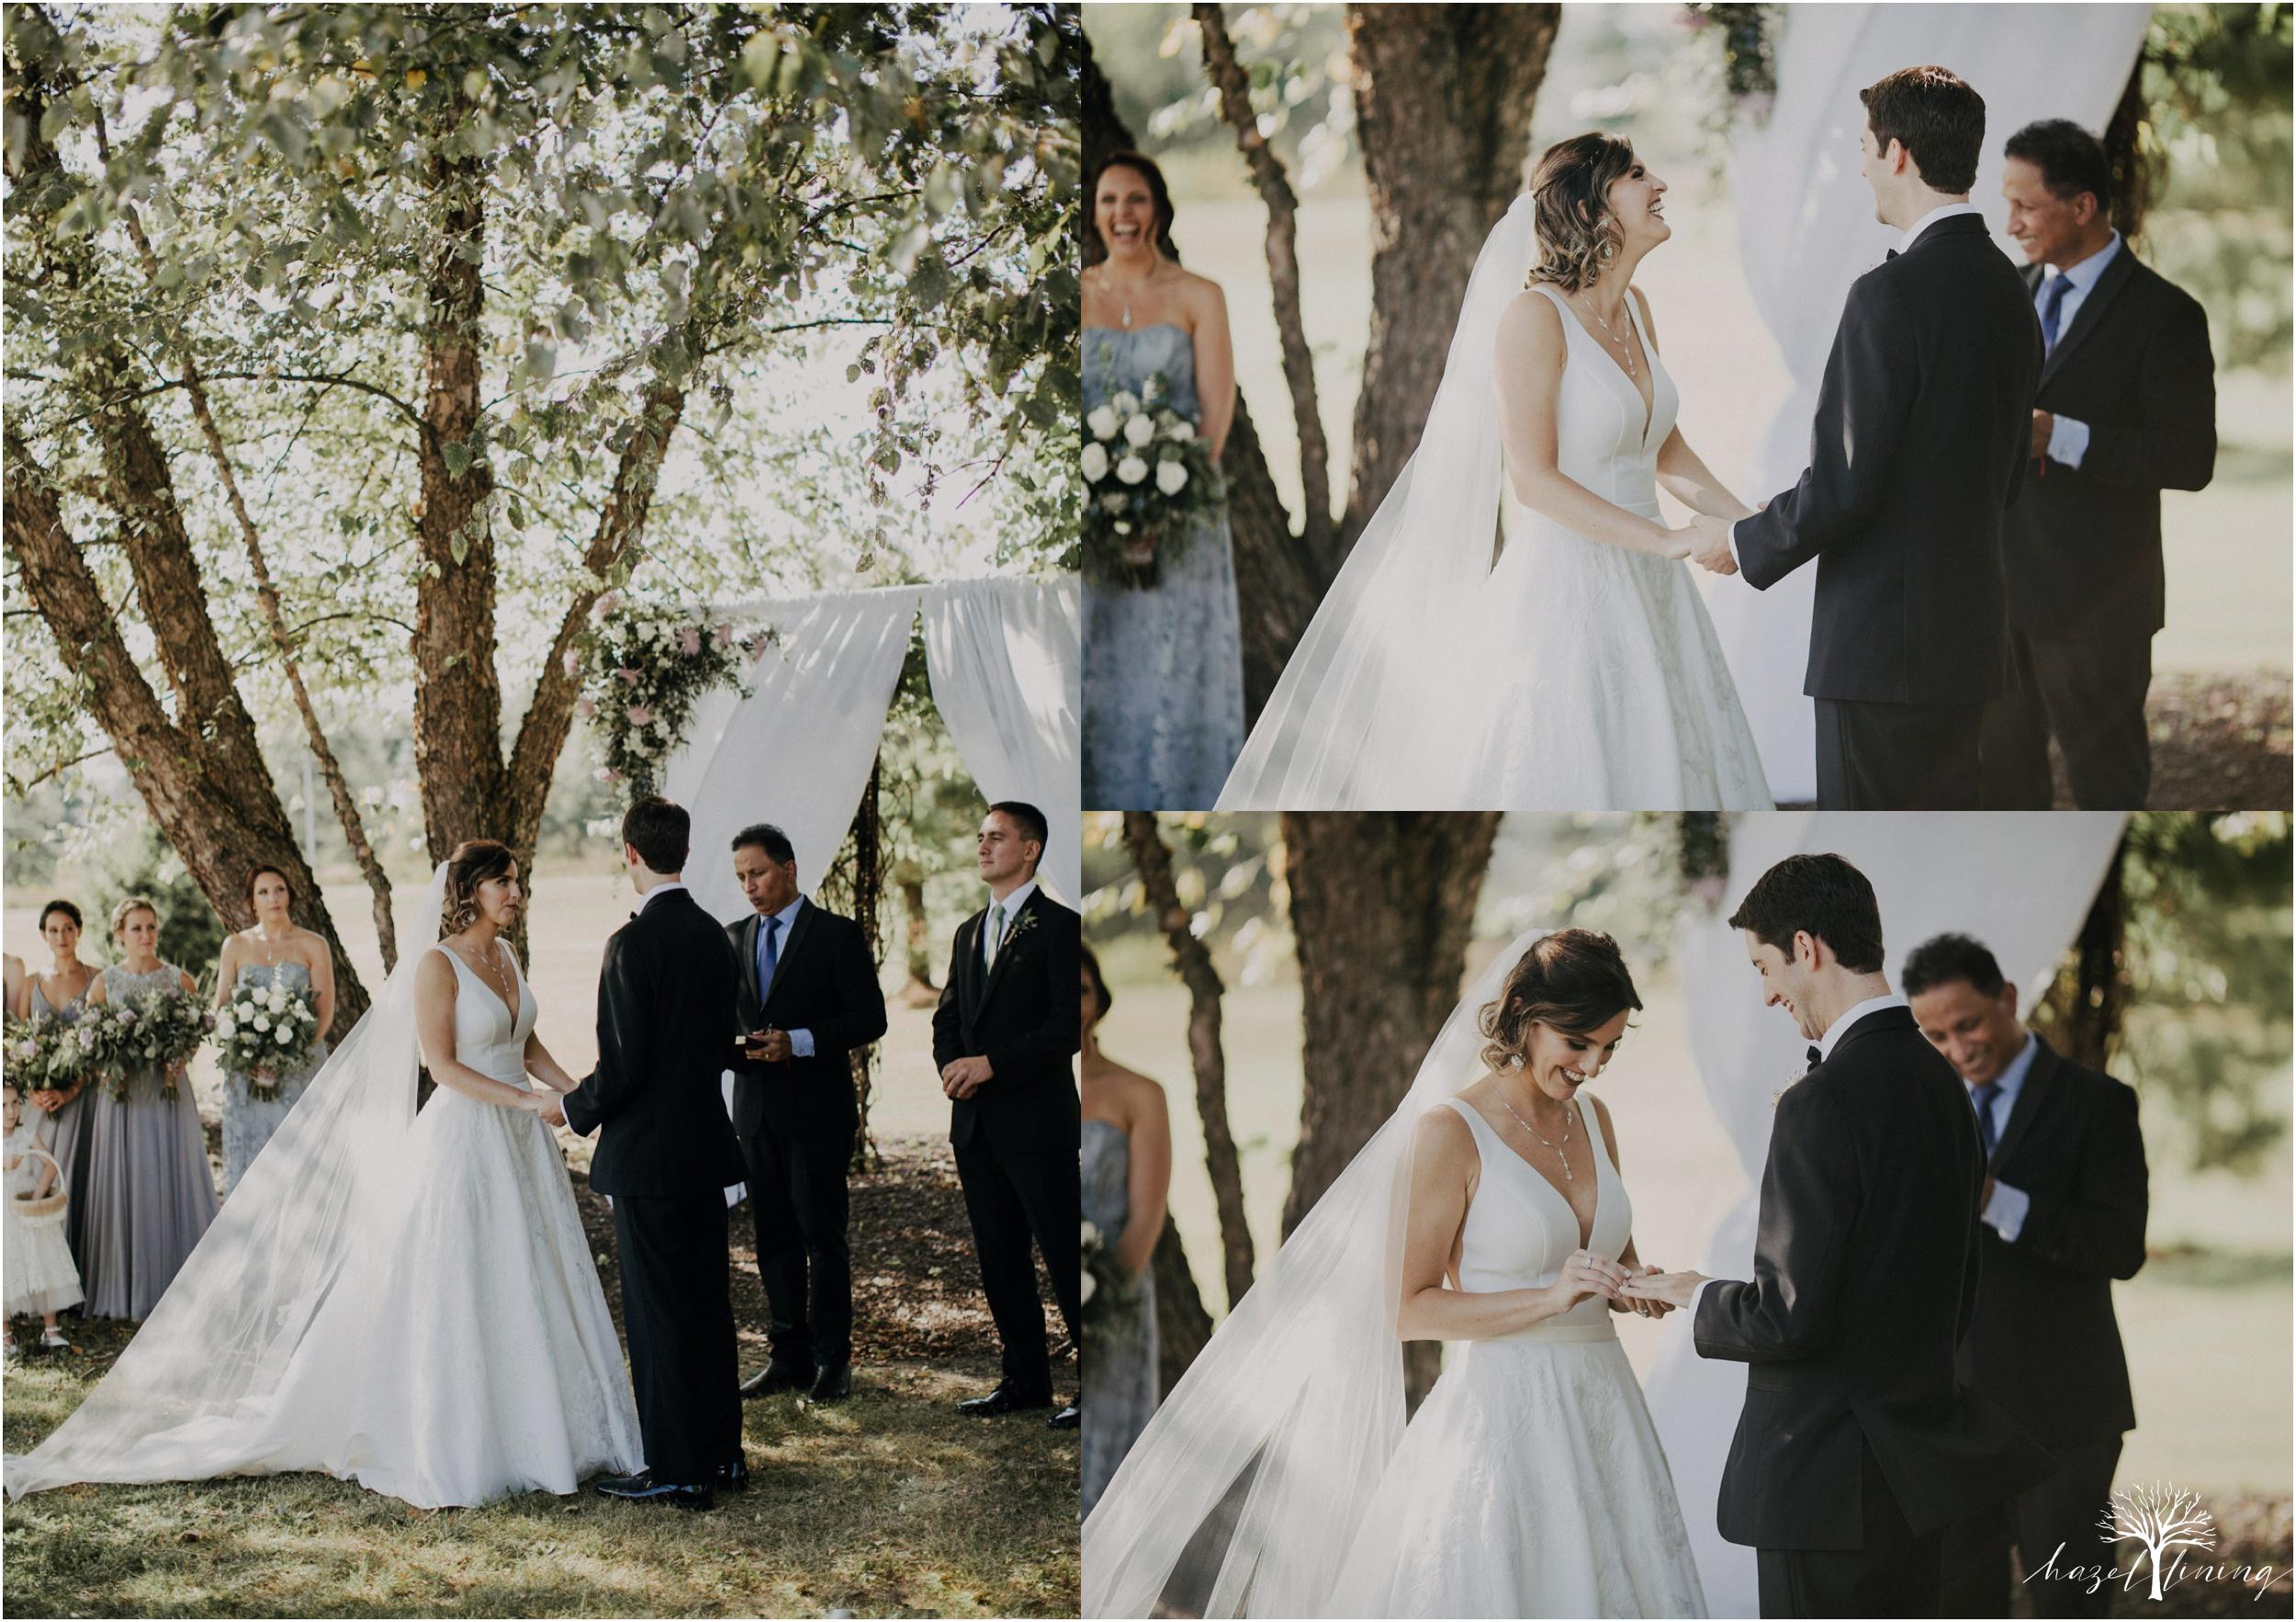 maureen-hepner-anthony-giordano-rose-bank-winery-newtow-pennsylvania-luxury-summer-wedding-hazel-lining-photography-destination-elopement-wedding-engagement-photography_0071.jpg